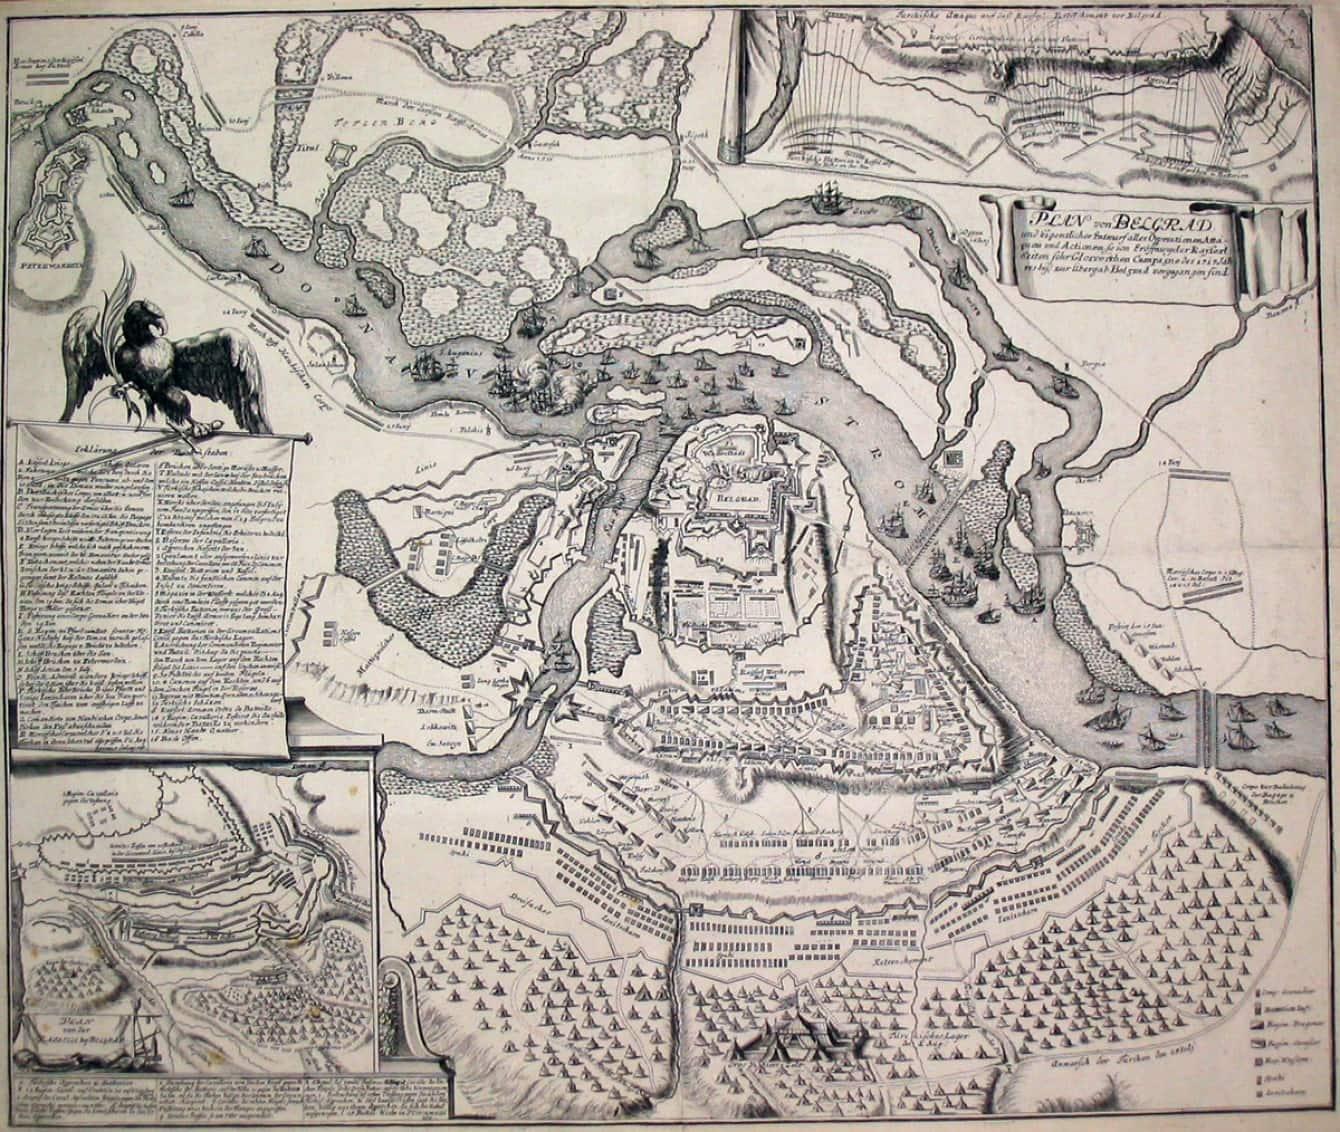 Opsada Beograda 1717, iz zbirke Vojnog muzeja, Beograd